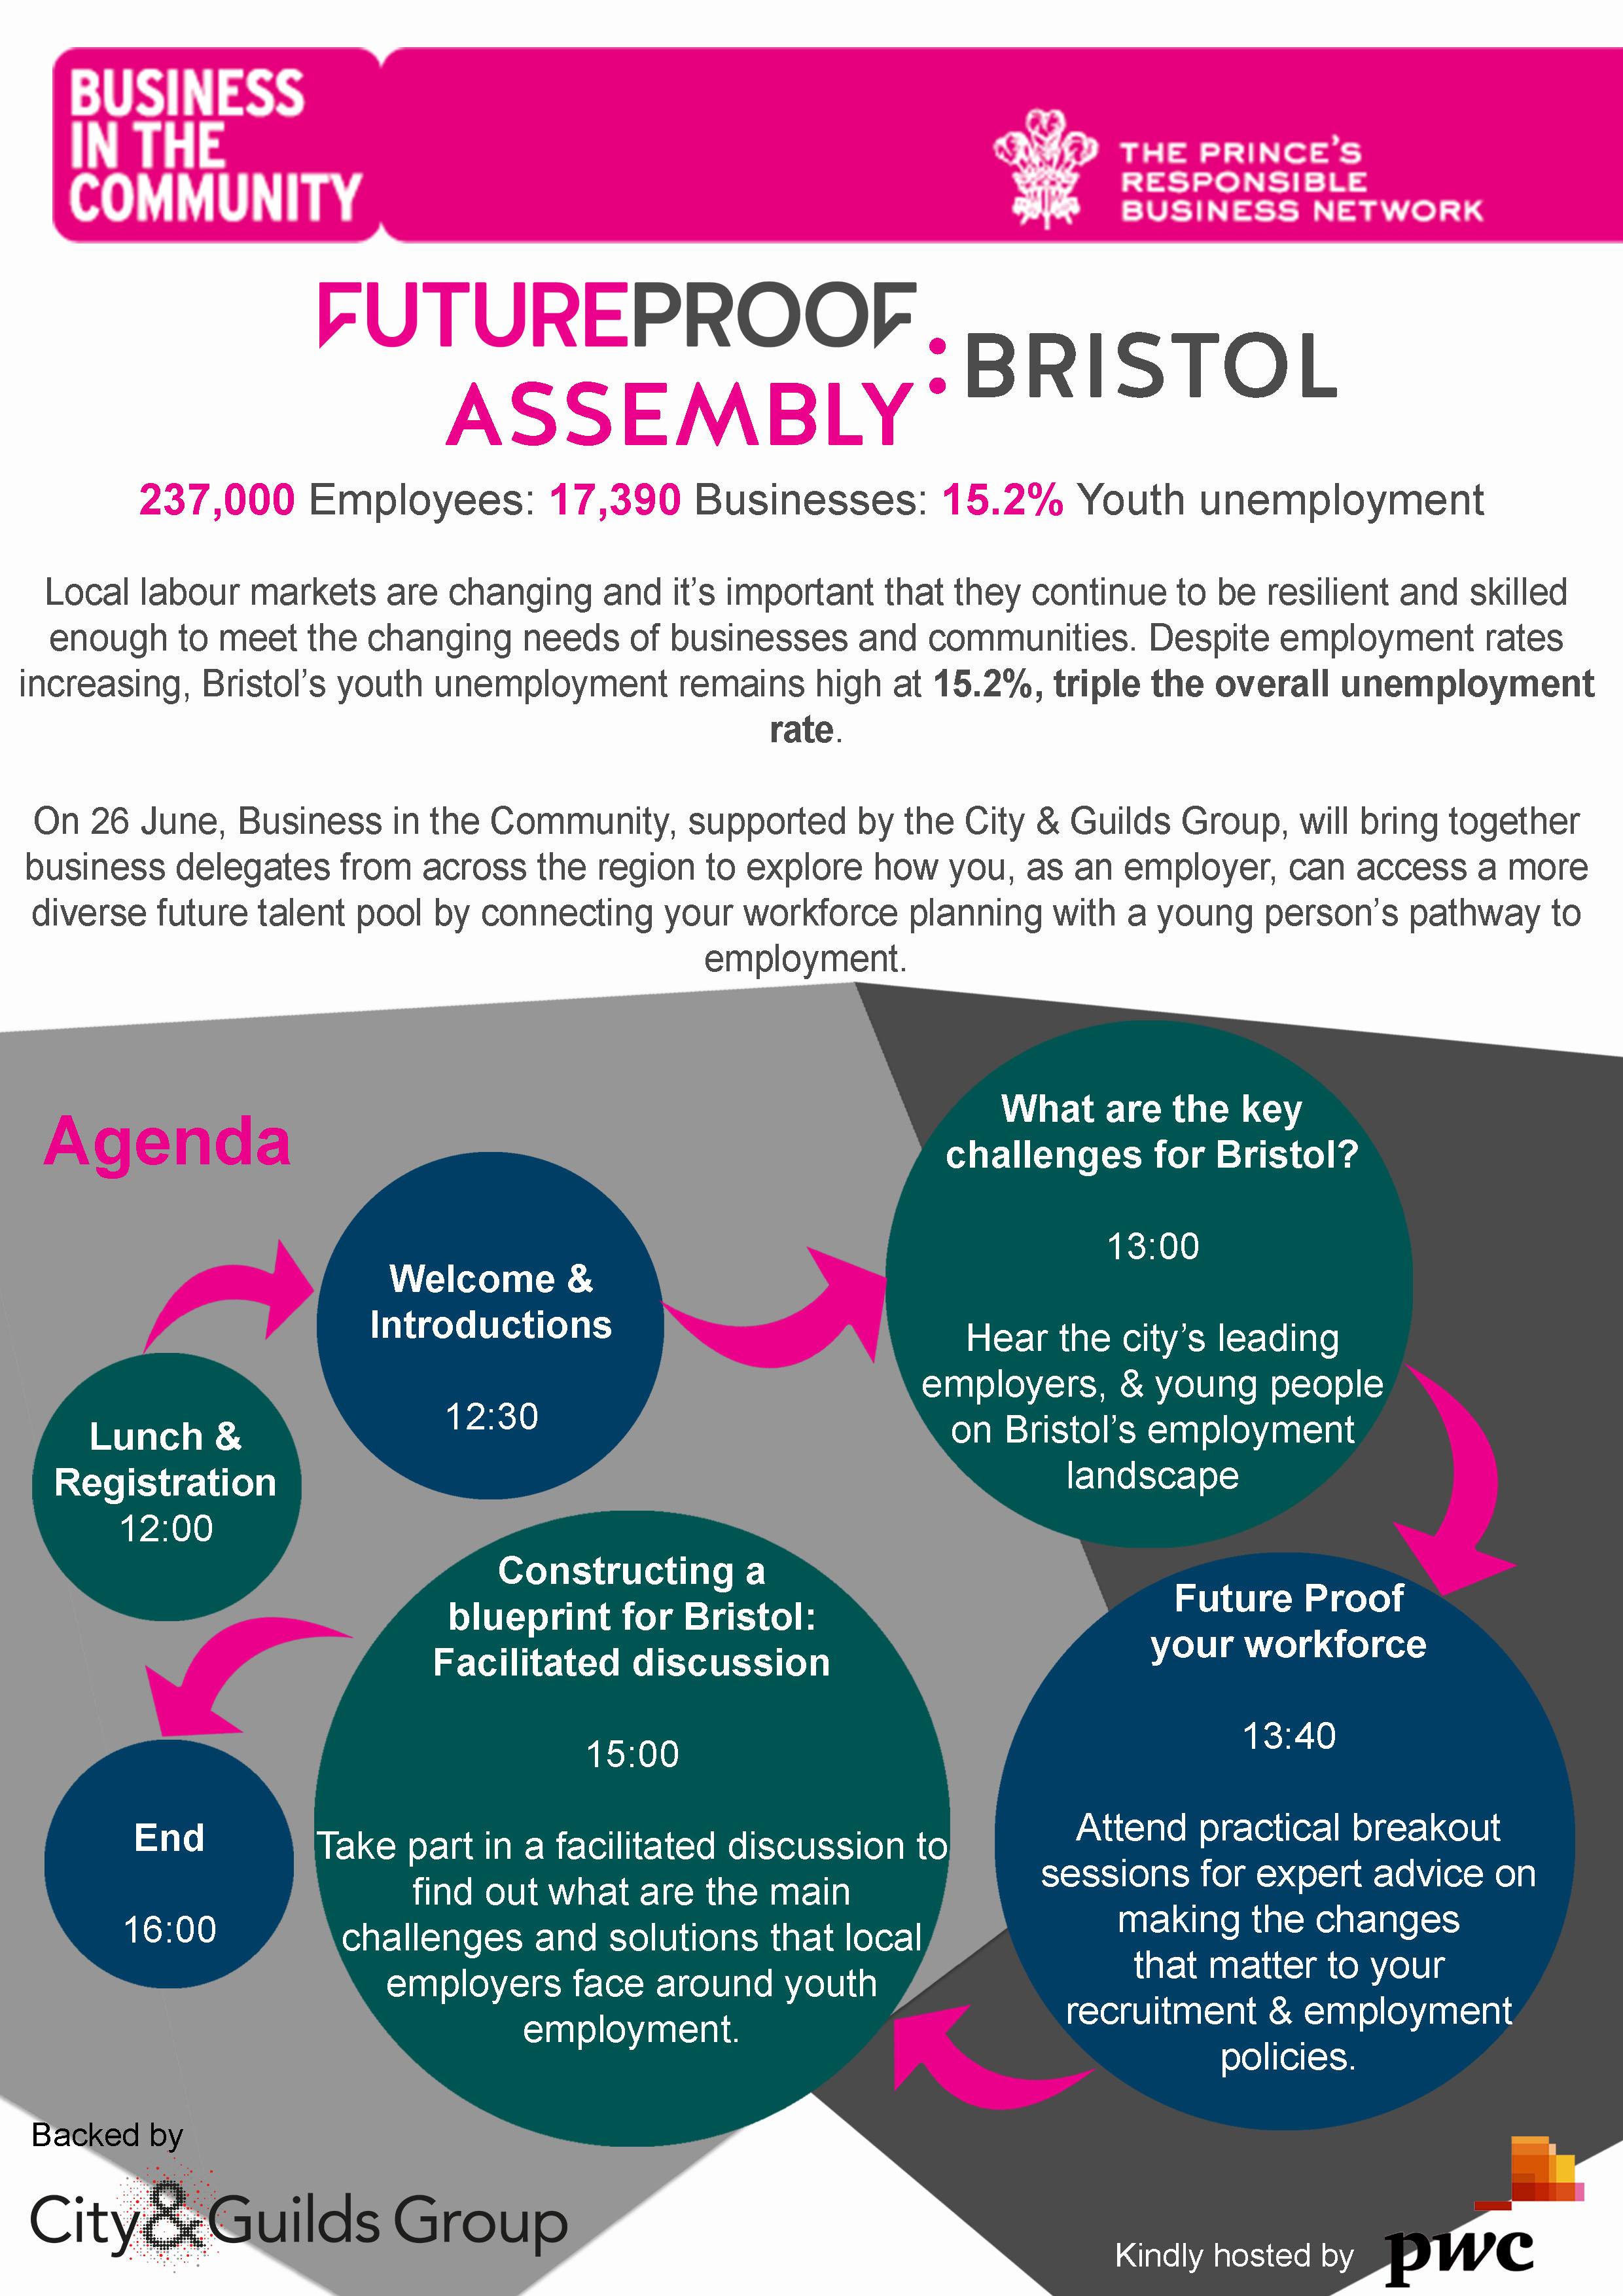 Bristol Agenda